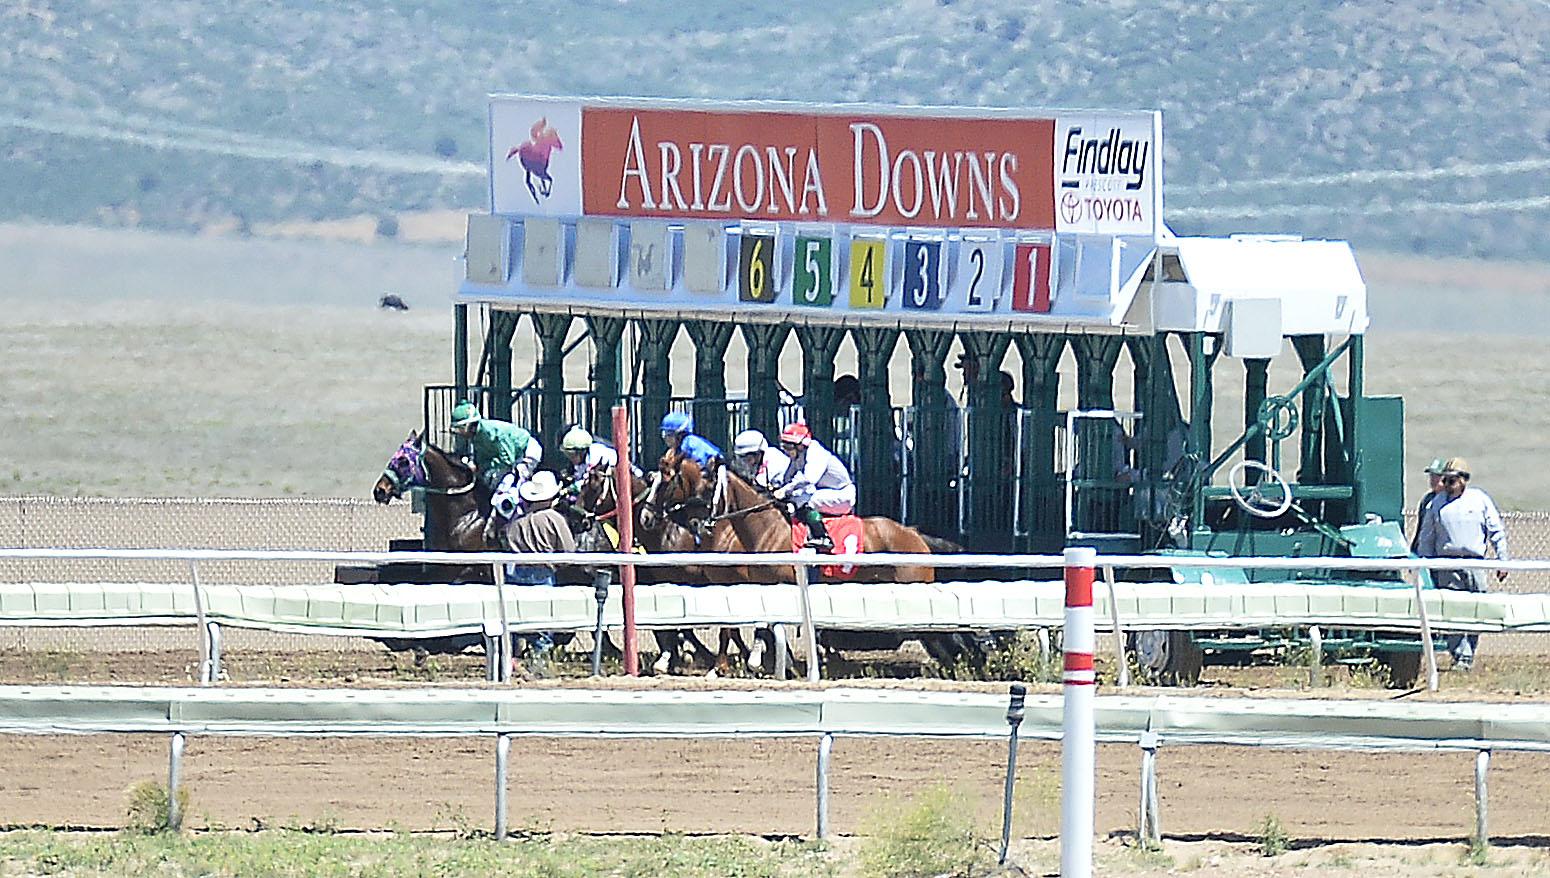 Horse racing returns to Arizona Downs